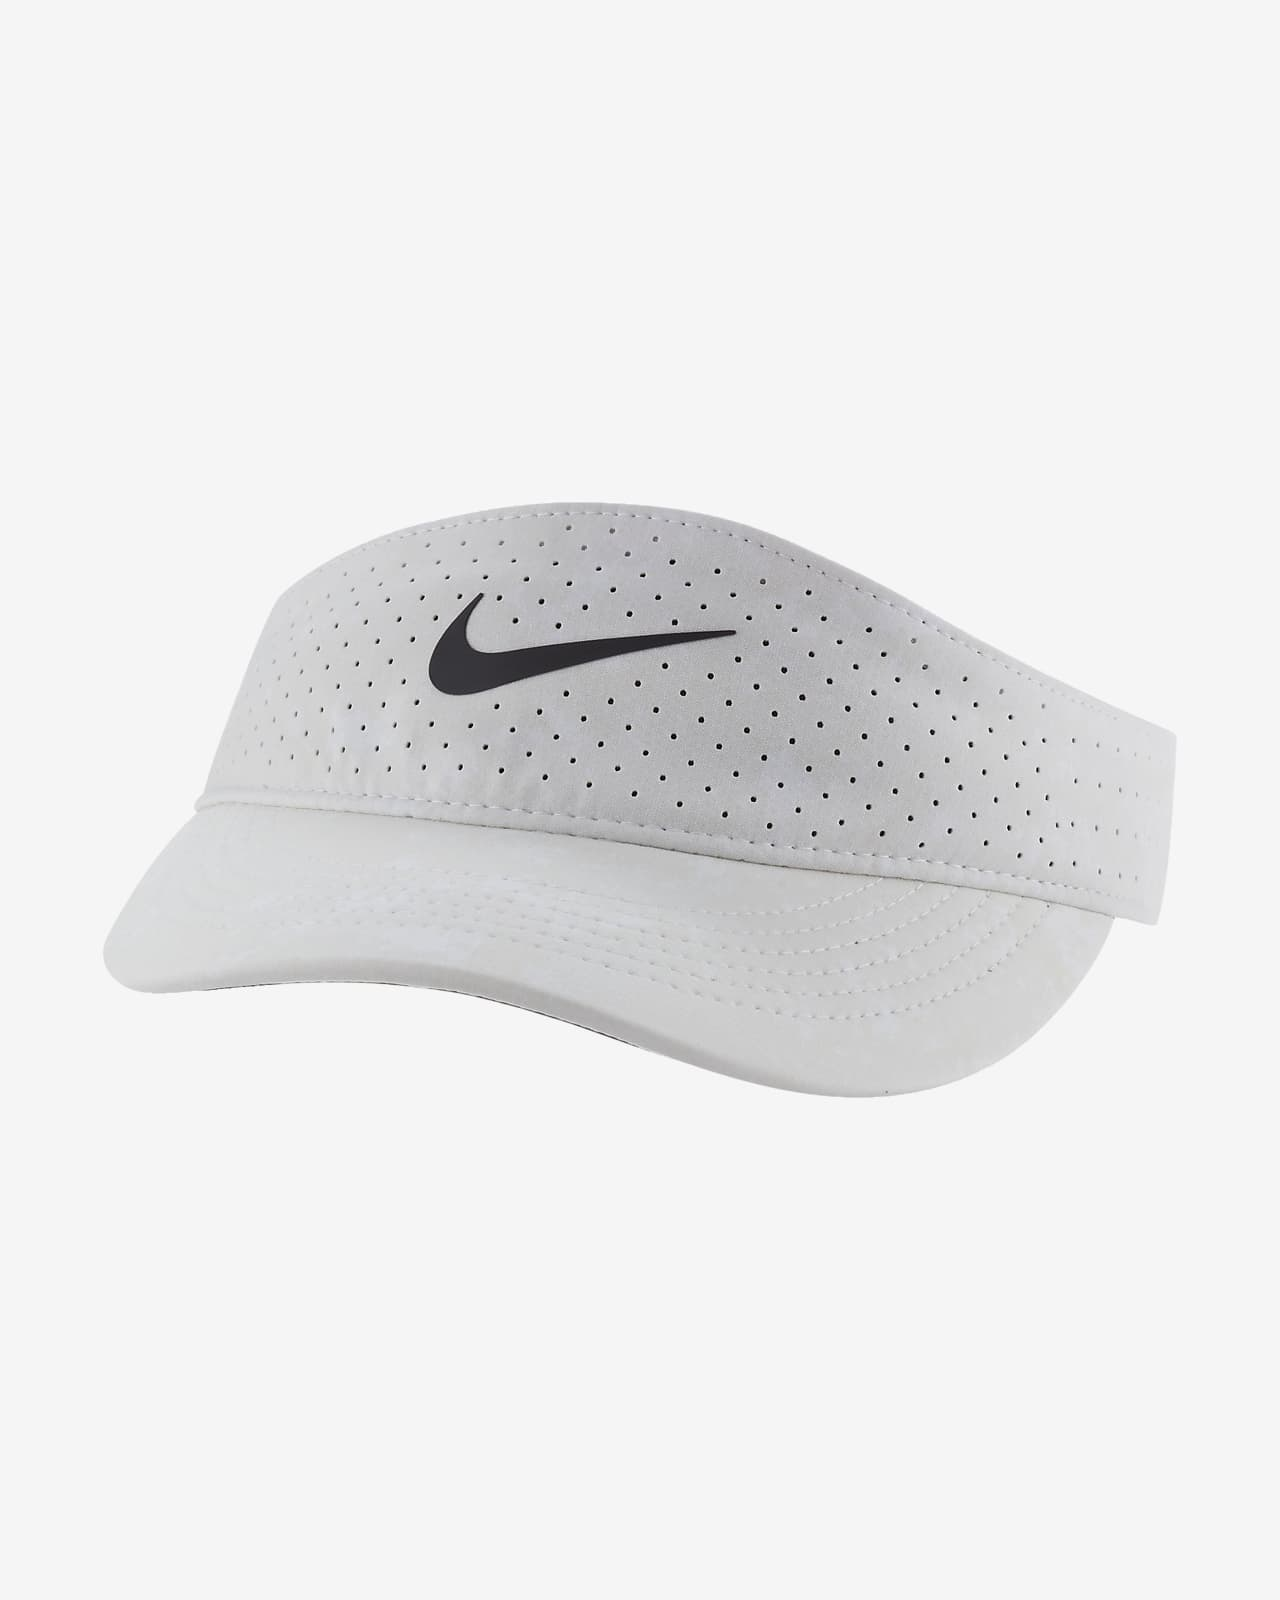 Visiera da tennis NikeCourt Advantage - Donna